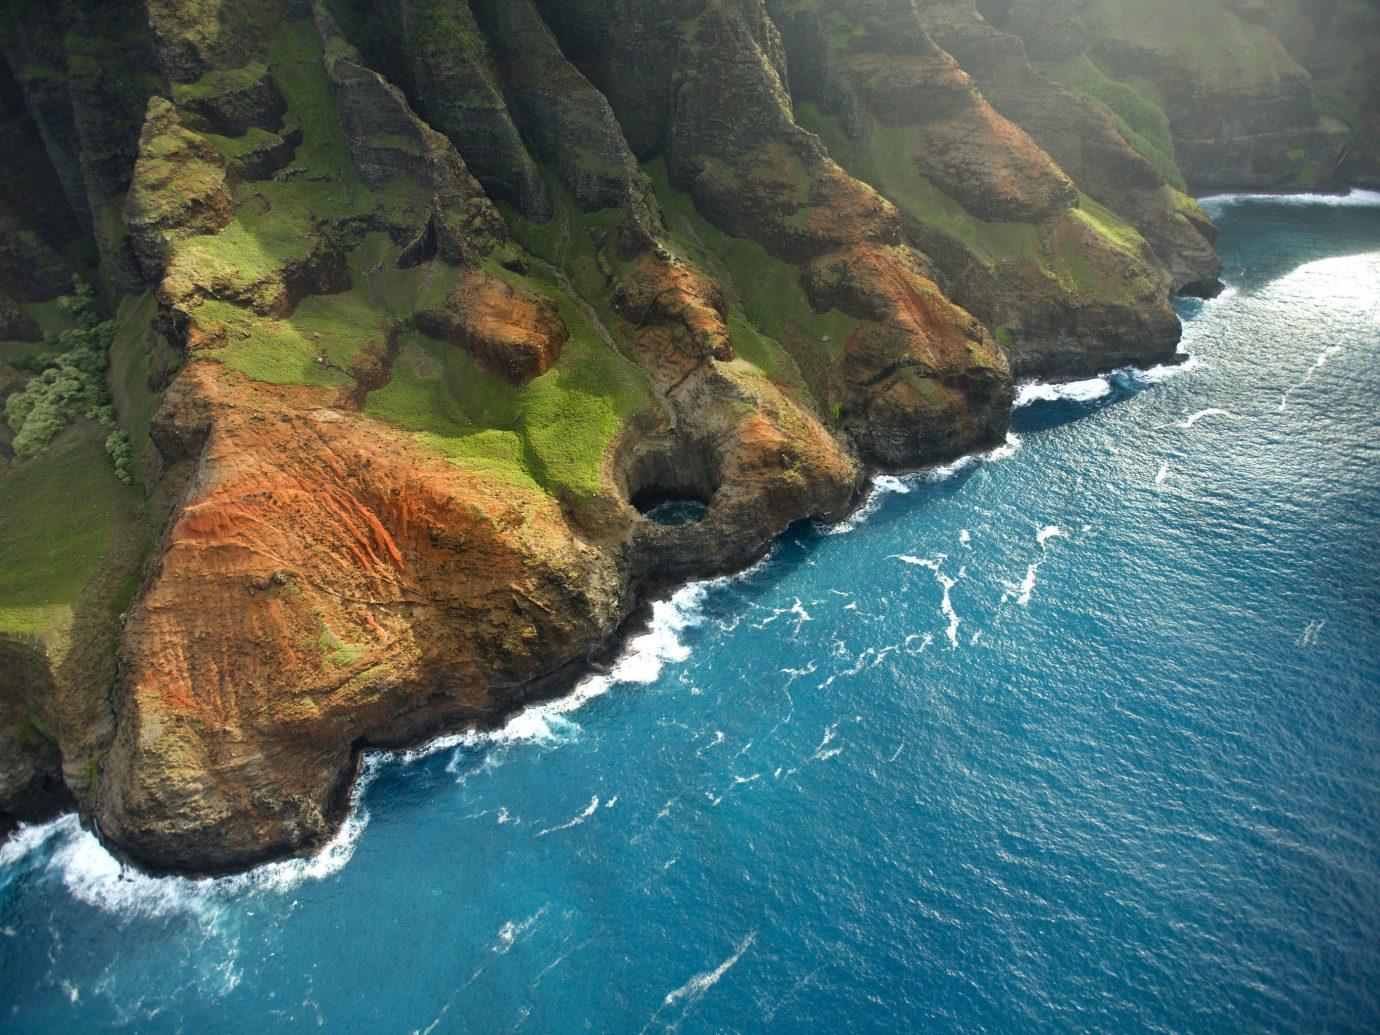 Trip Ideas water Nature outdoor mountain rock landform geographical feature Coast Sea cliff Ocean terrain bay fjord cape